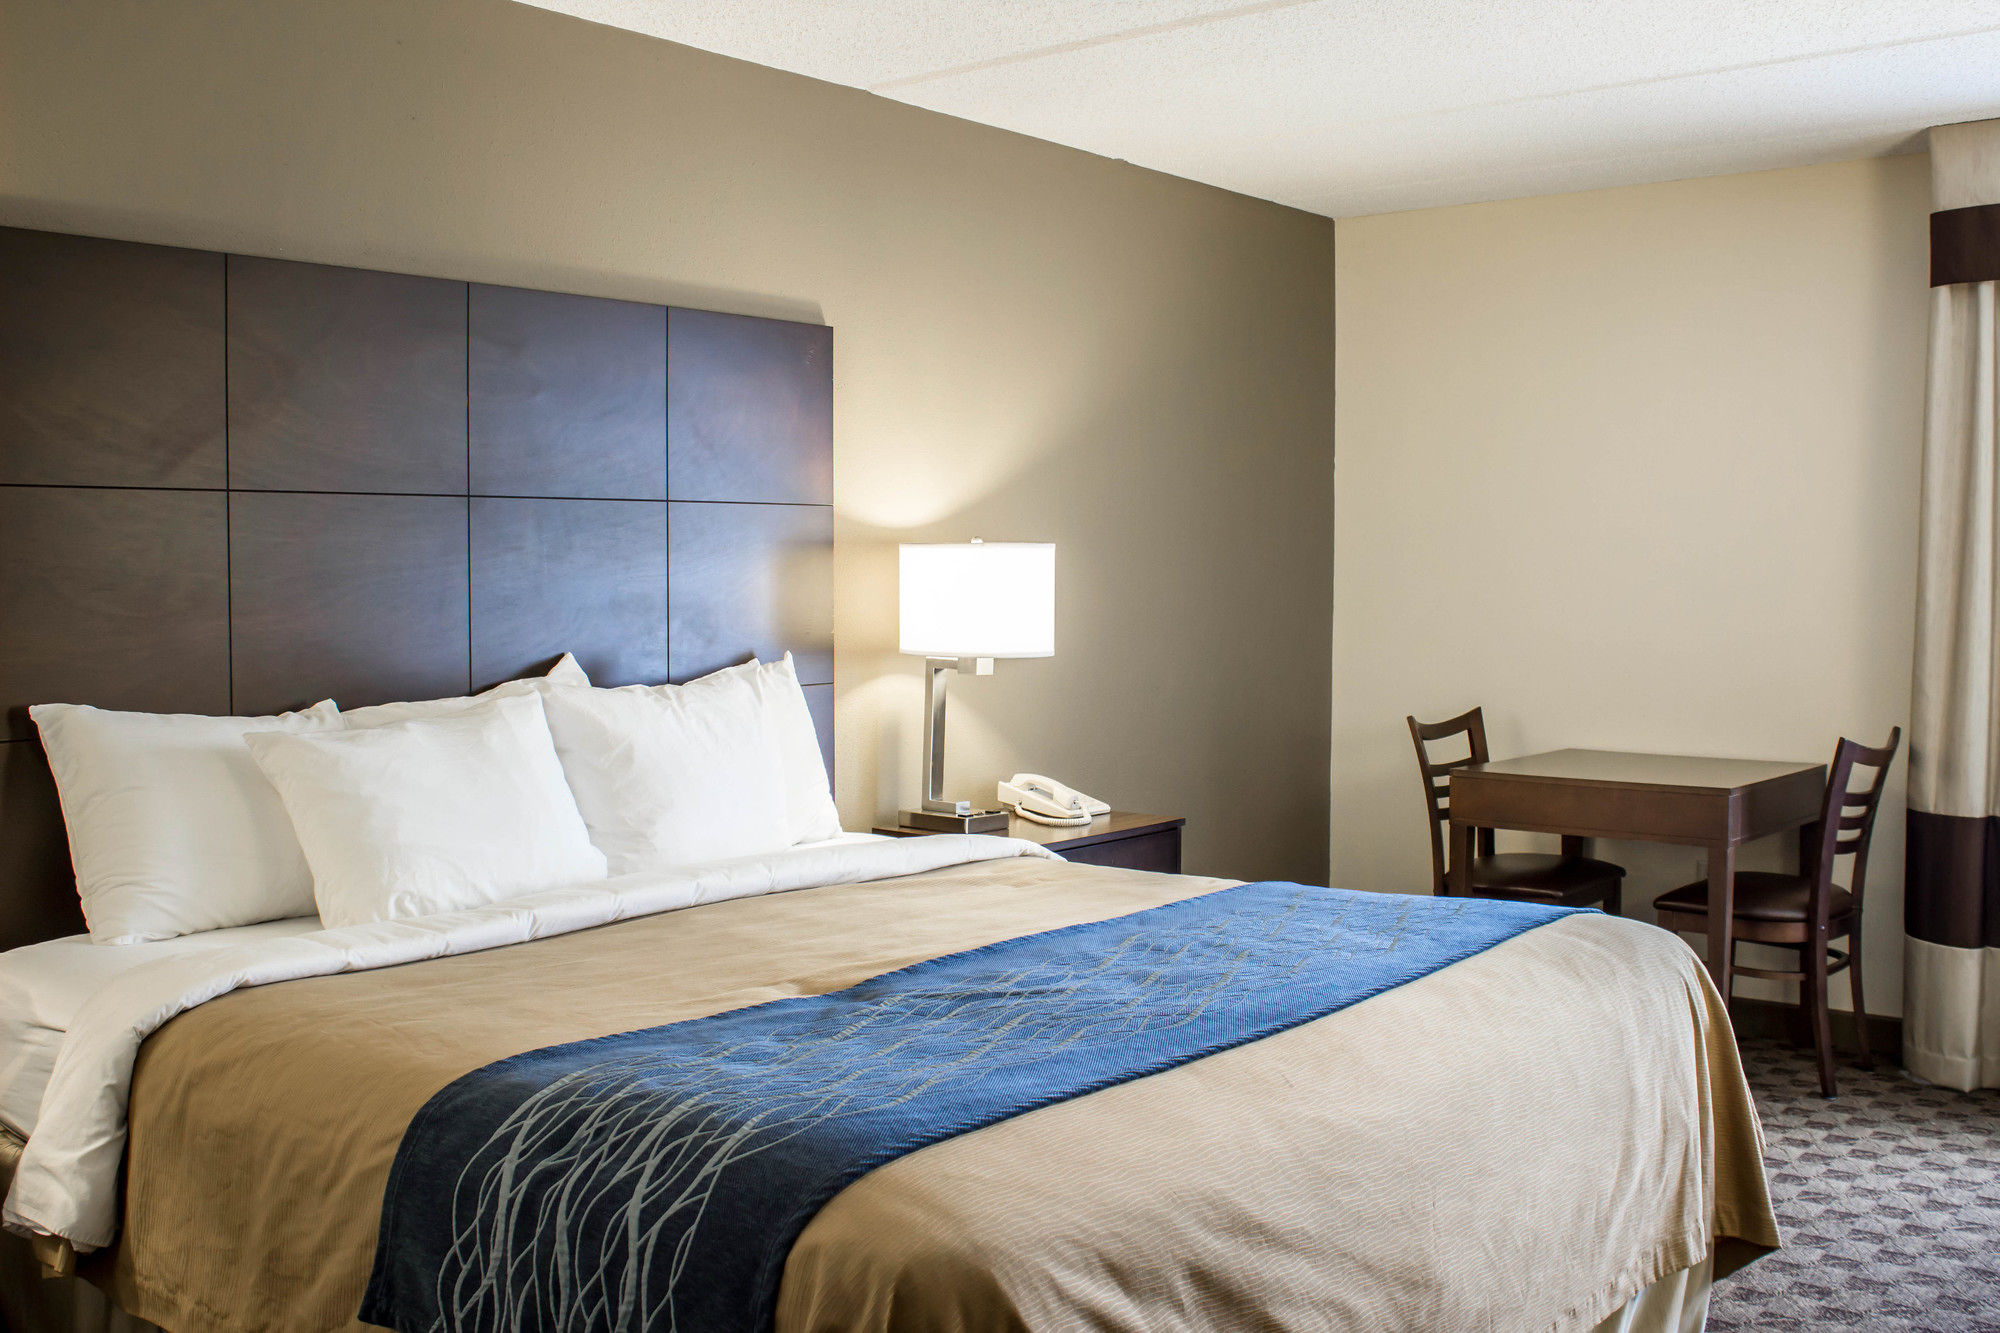 Comfort Inn Fuquay Varina